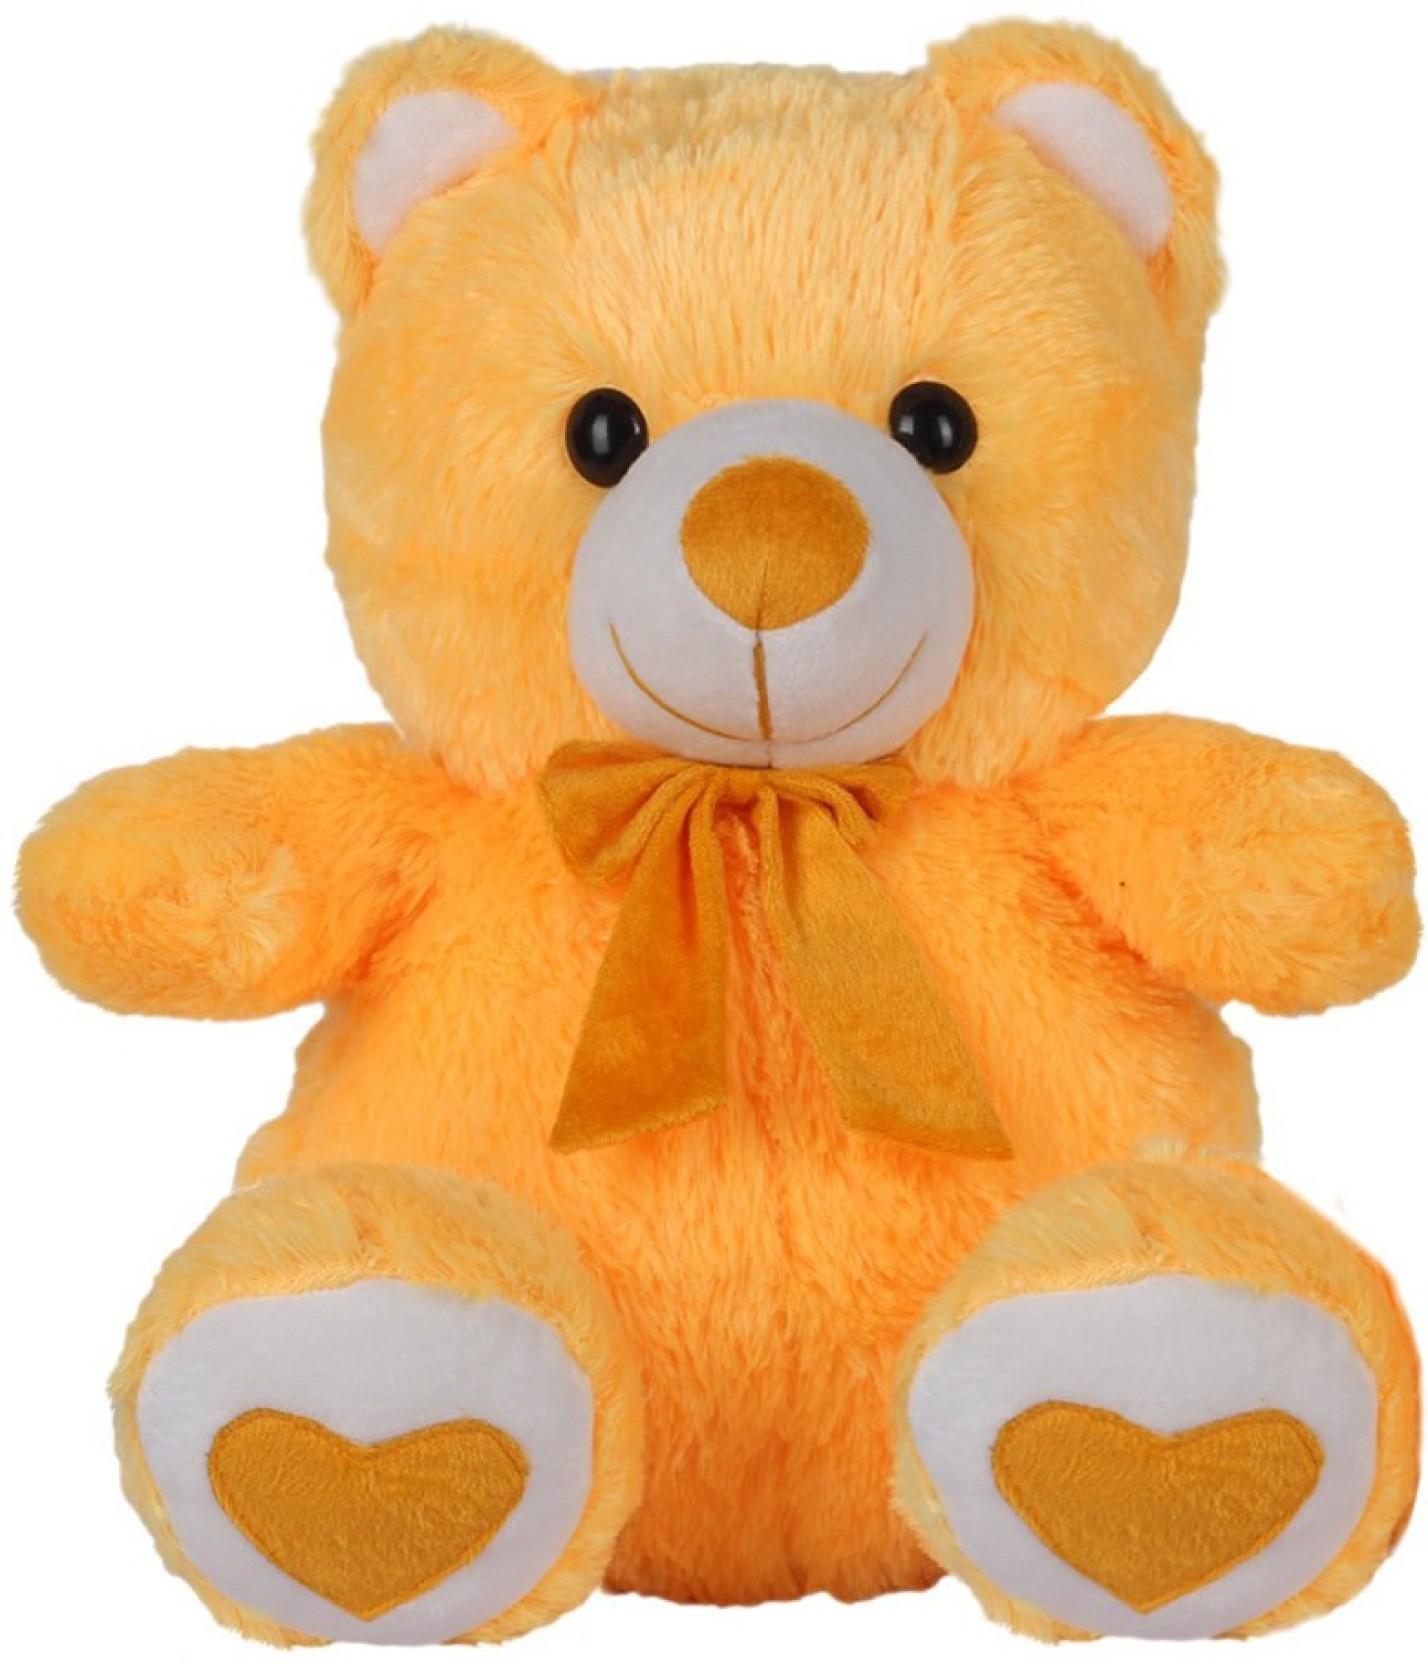 Ultra Spongy Teddy Soft Toy 15 Inch Spongy Teddy Soft